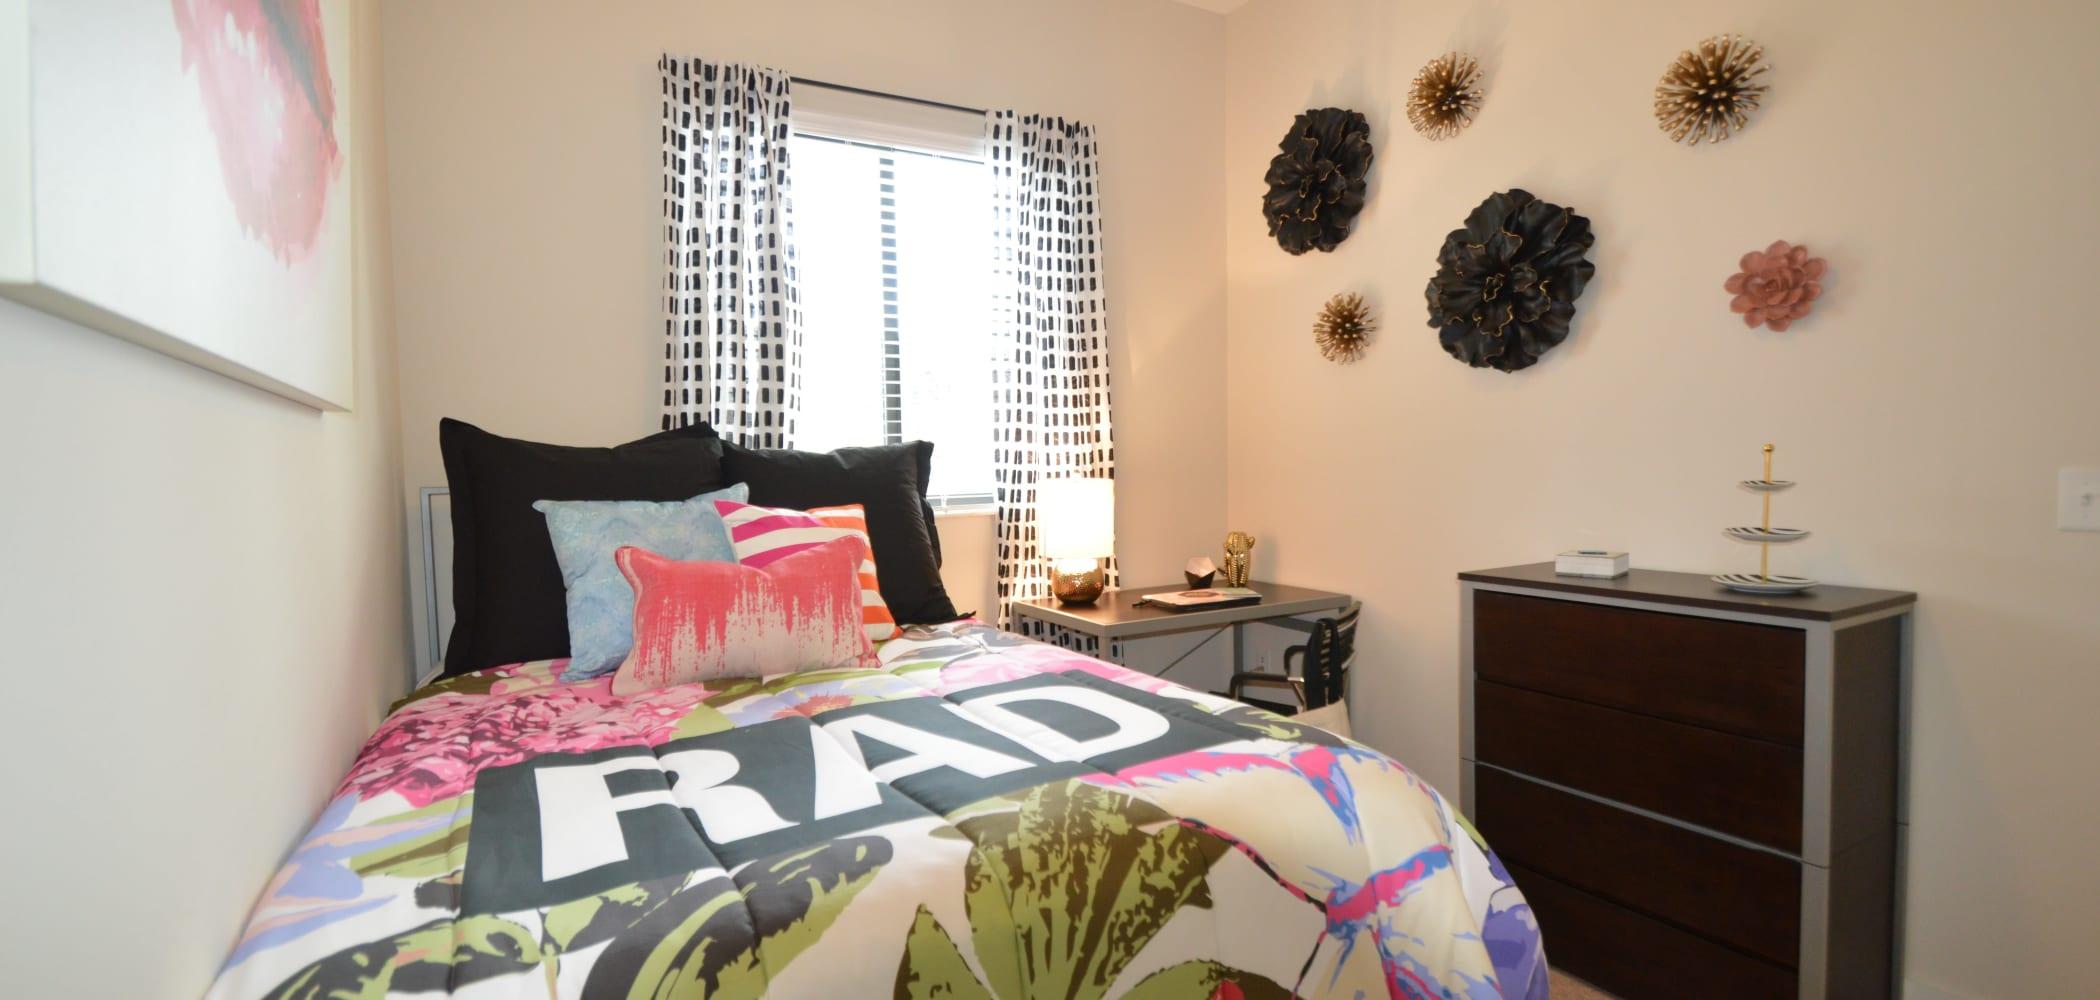 Cute bedroom set up at University Park in Boca Raton, Florida